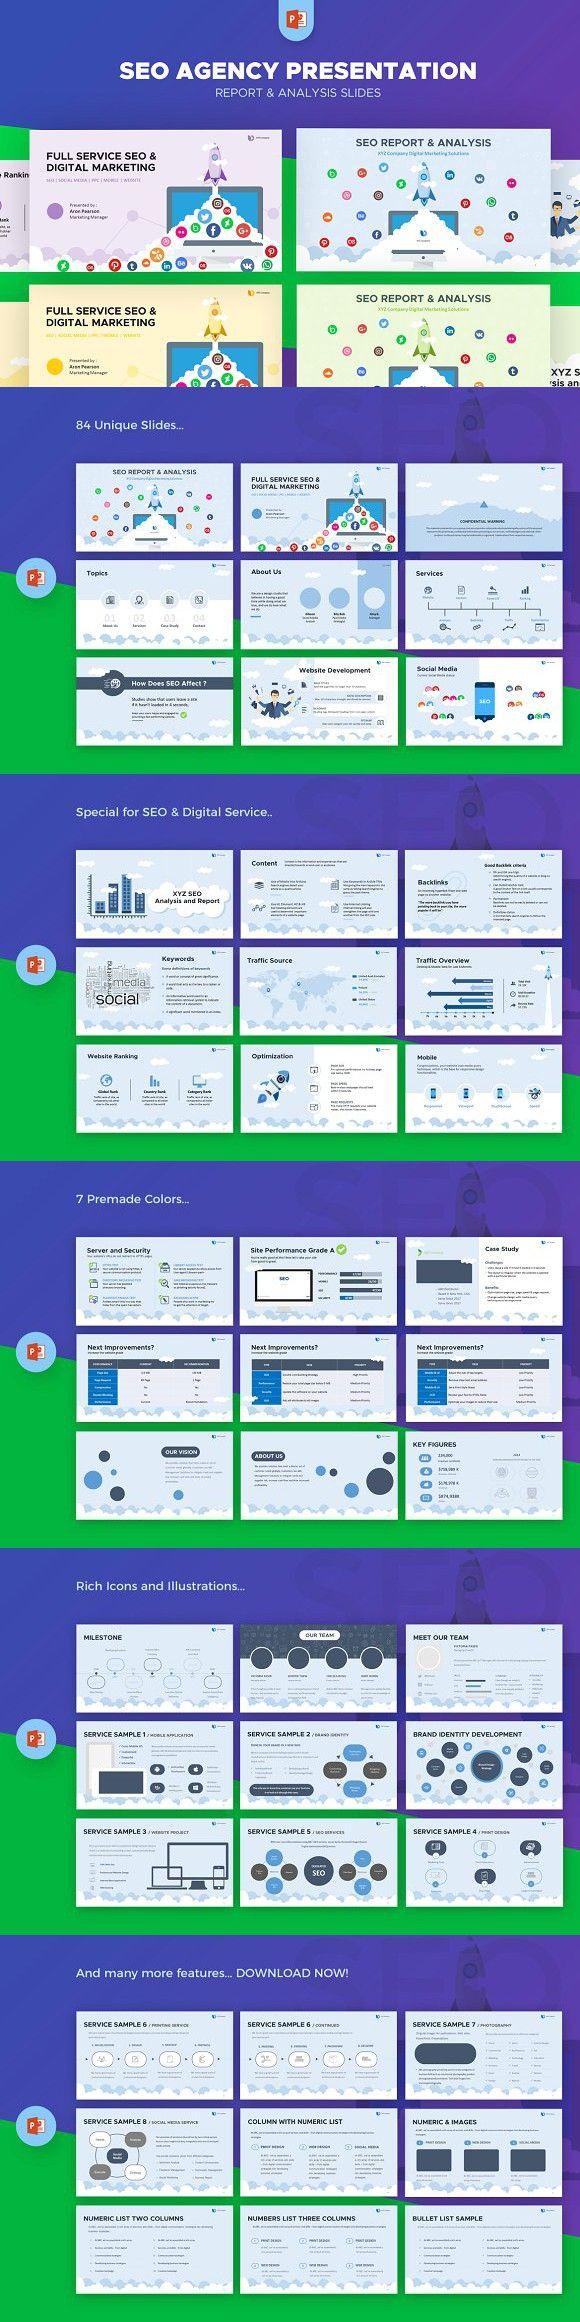 SEO Agency Report & Analysis. Presentation Templates